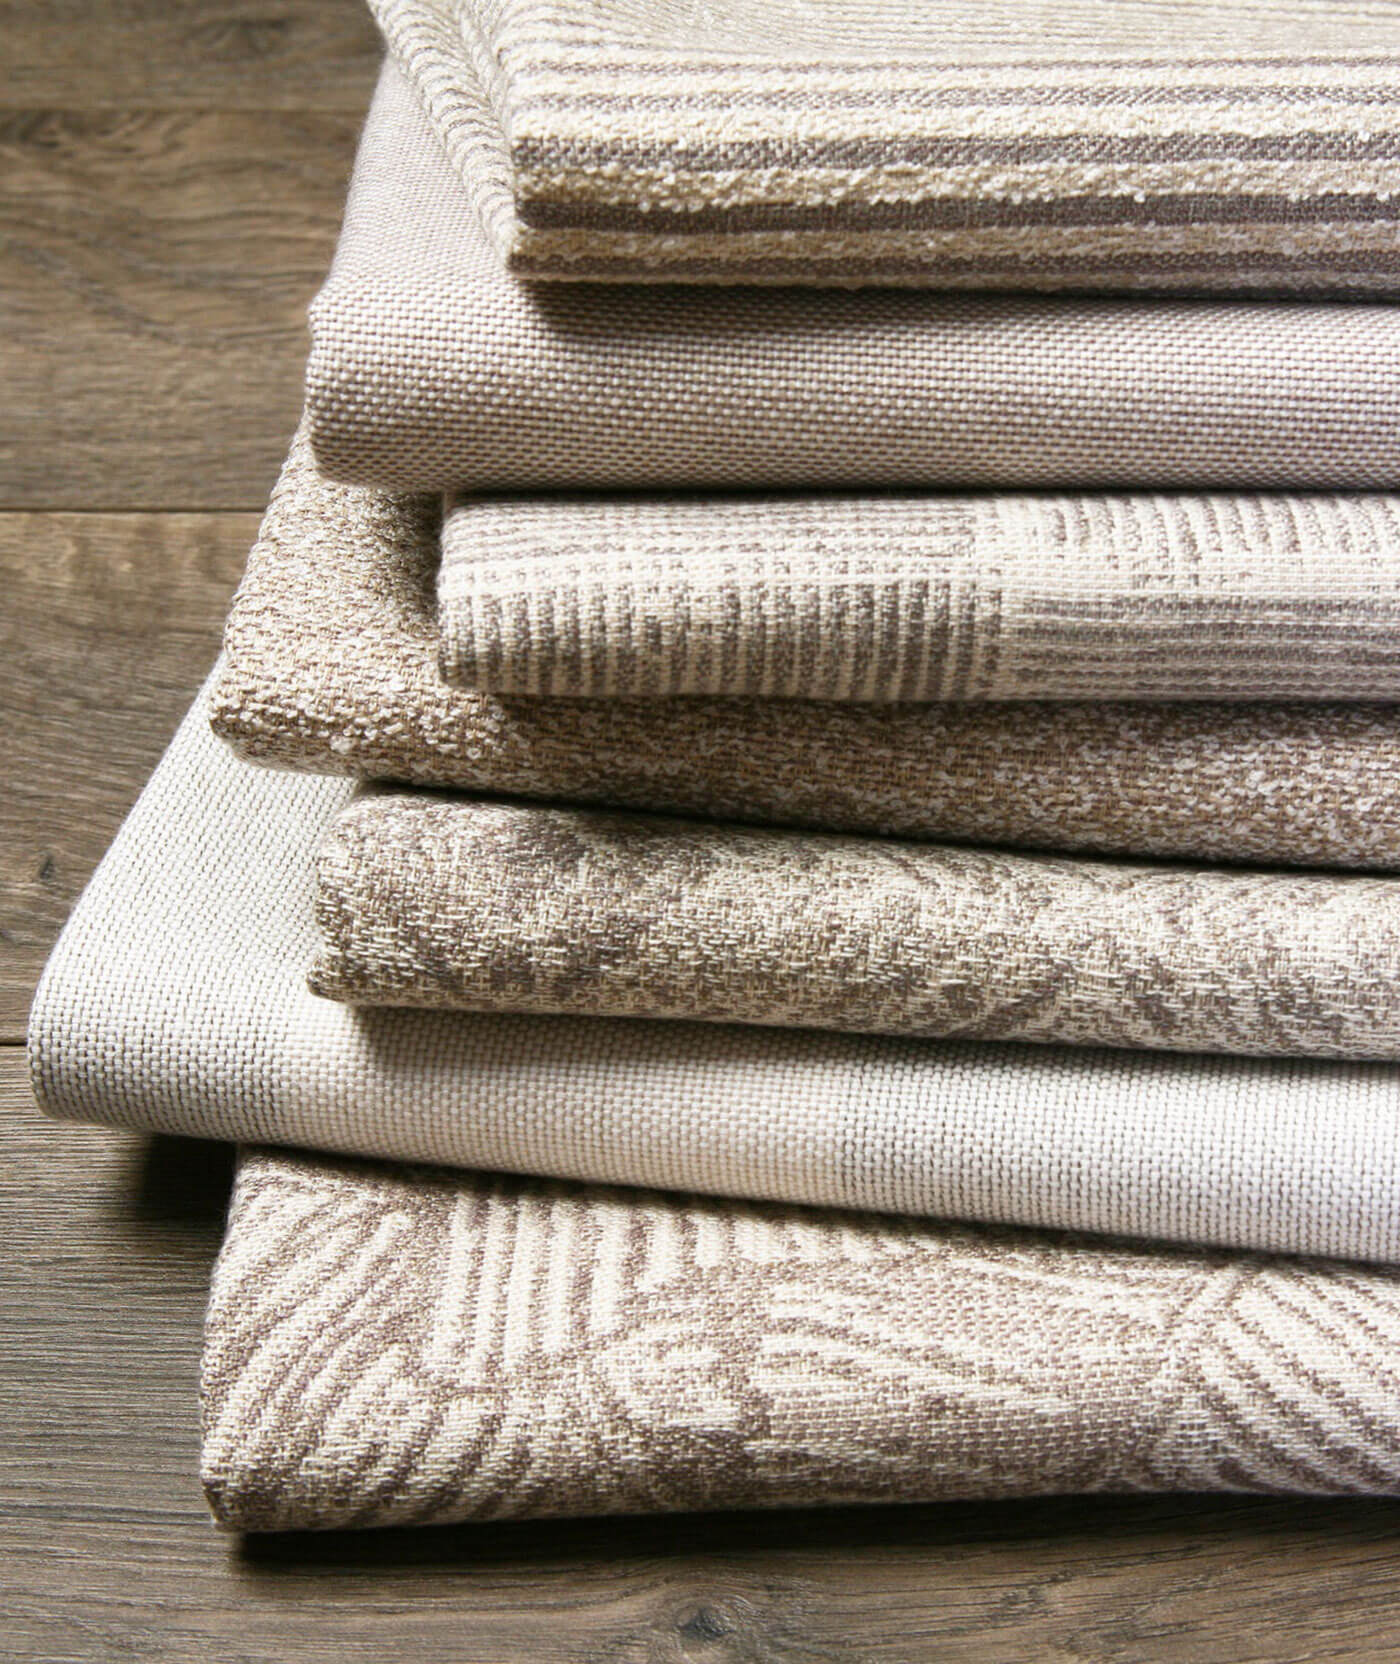 Neutral Fabrics Designed by Richard Frinier